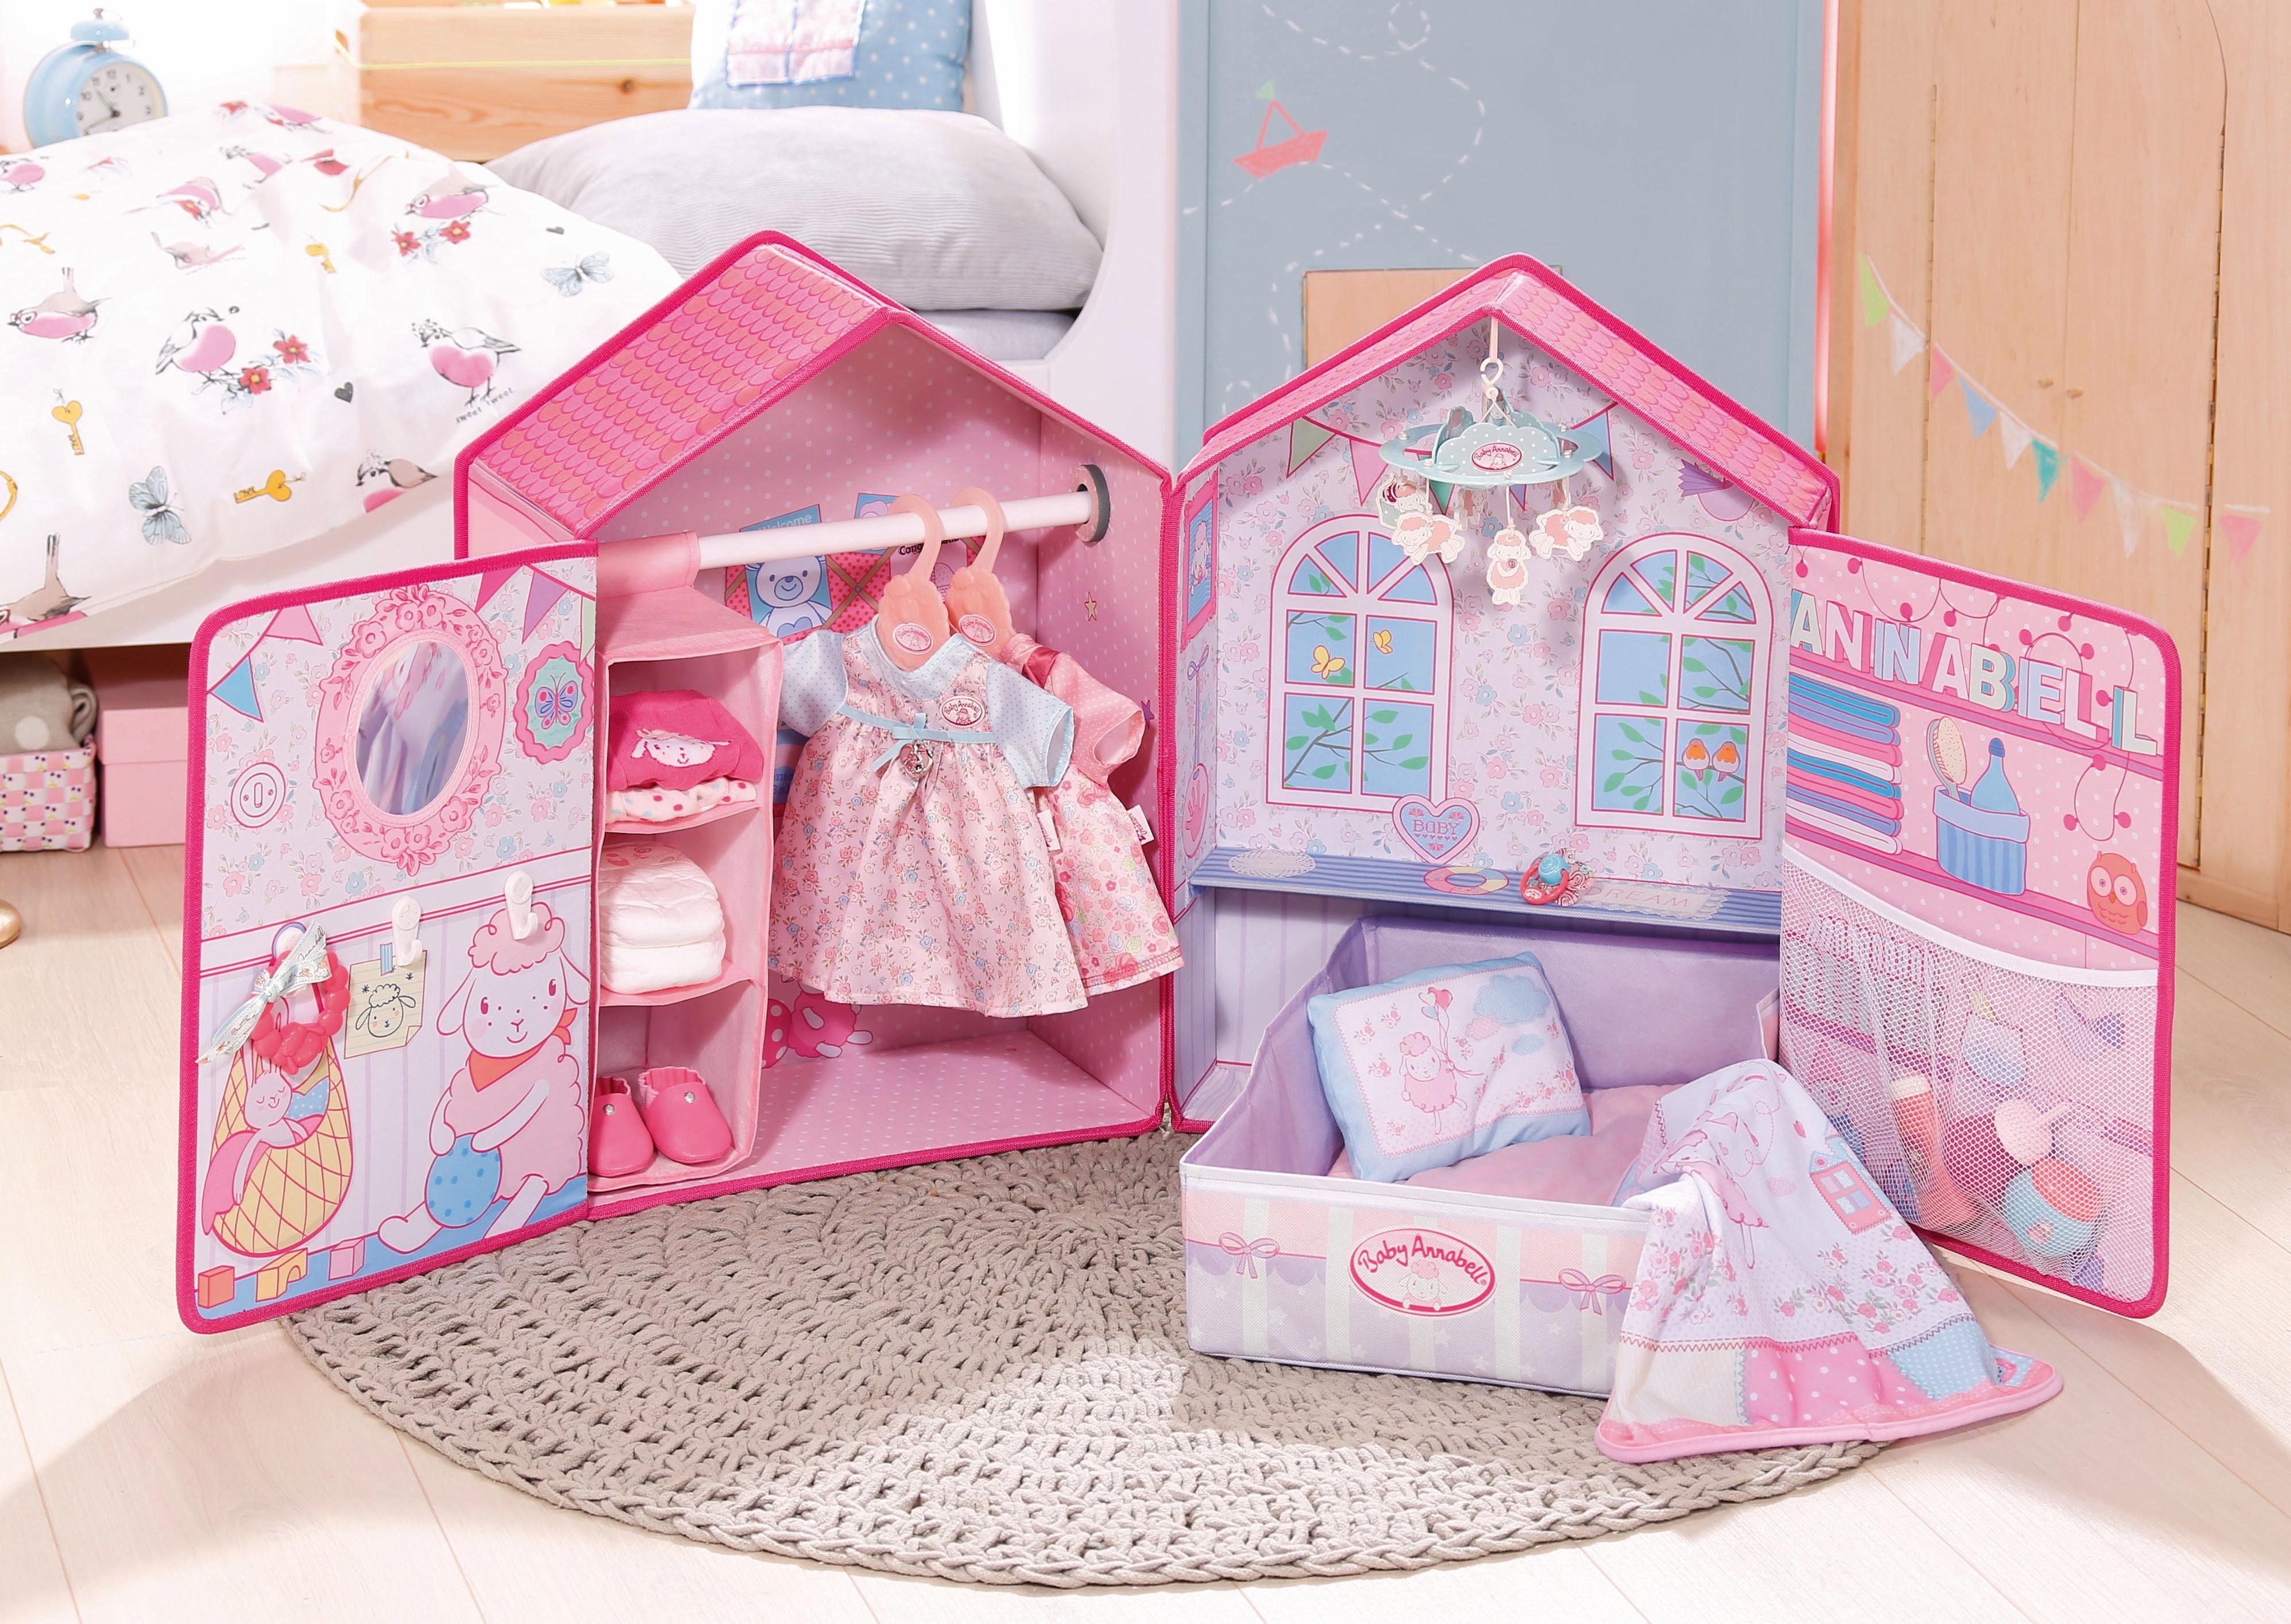 Baby Slaapkamer Accessoires : Zapf creation poppenaccessoire baby annabell slaapkamer in de